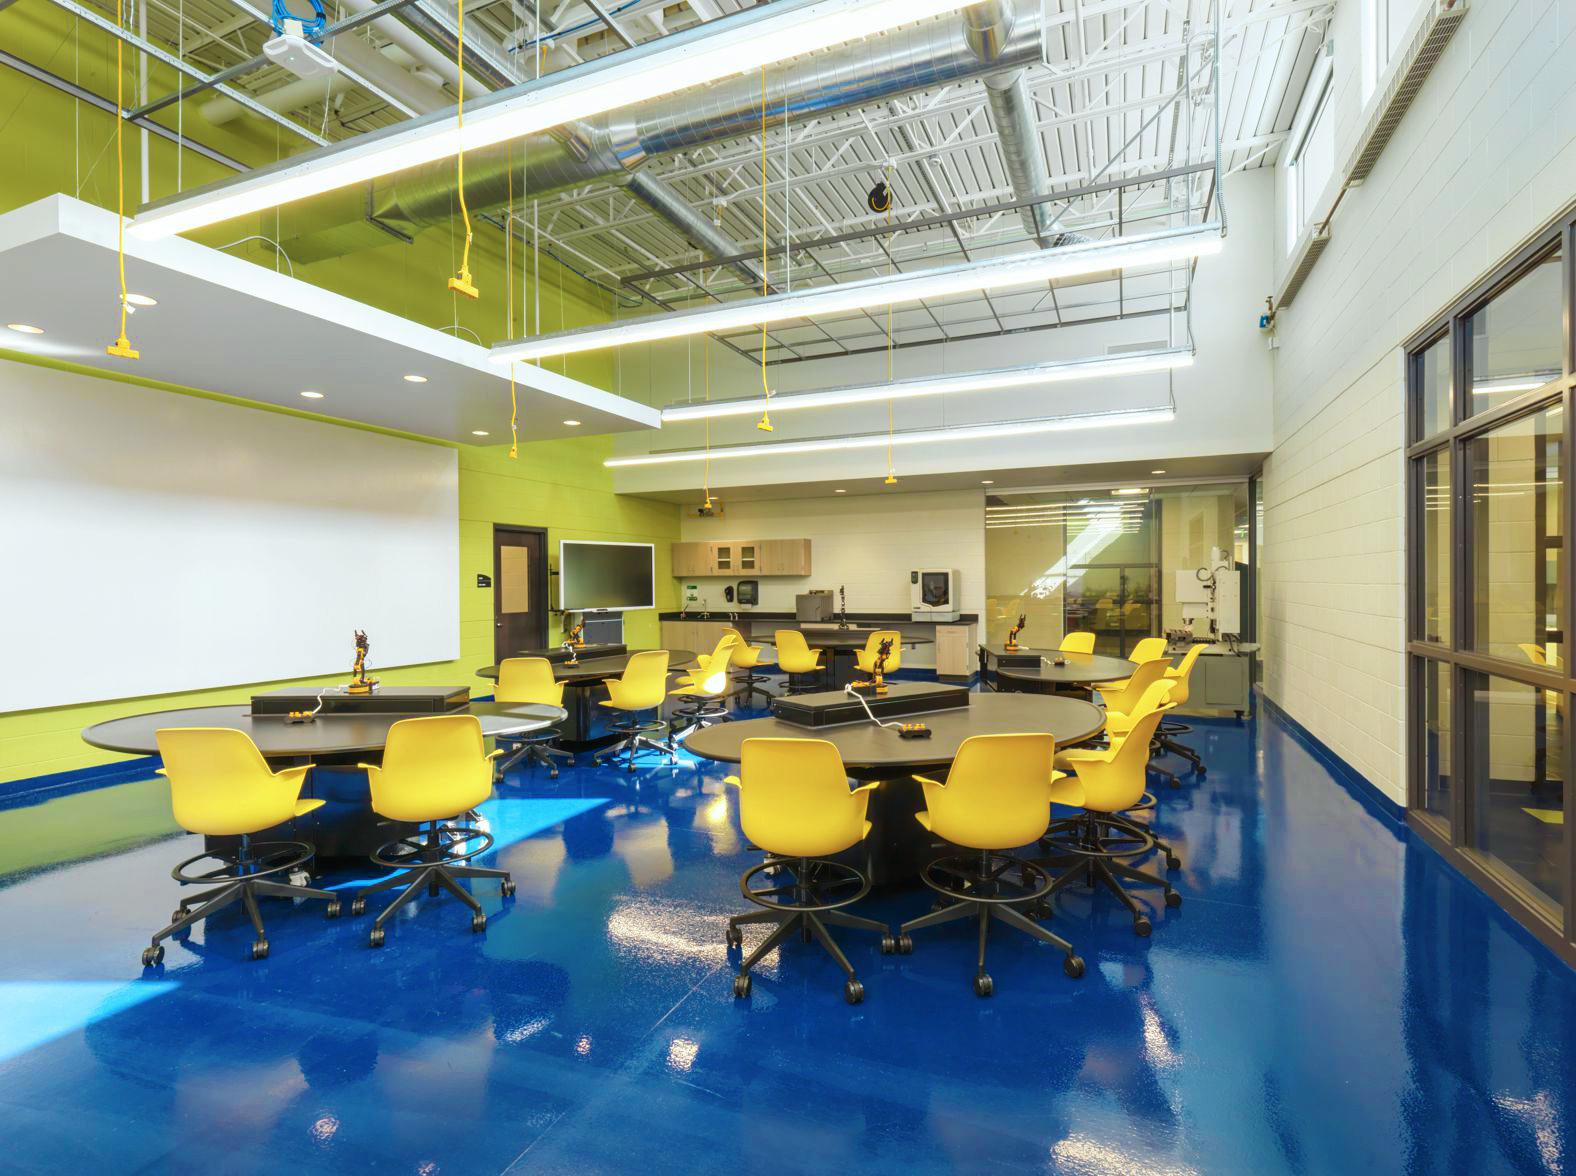 John C. Dunham STEM Partnership School / Cordogan Clark & Associates Architects